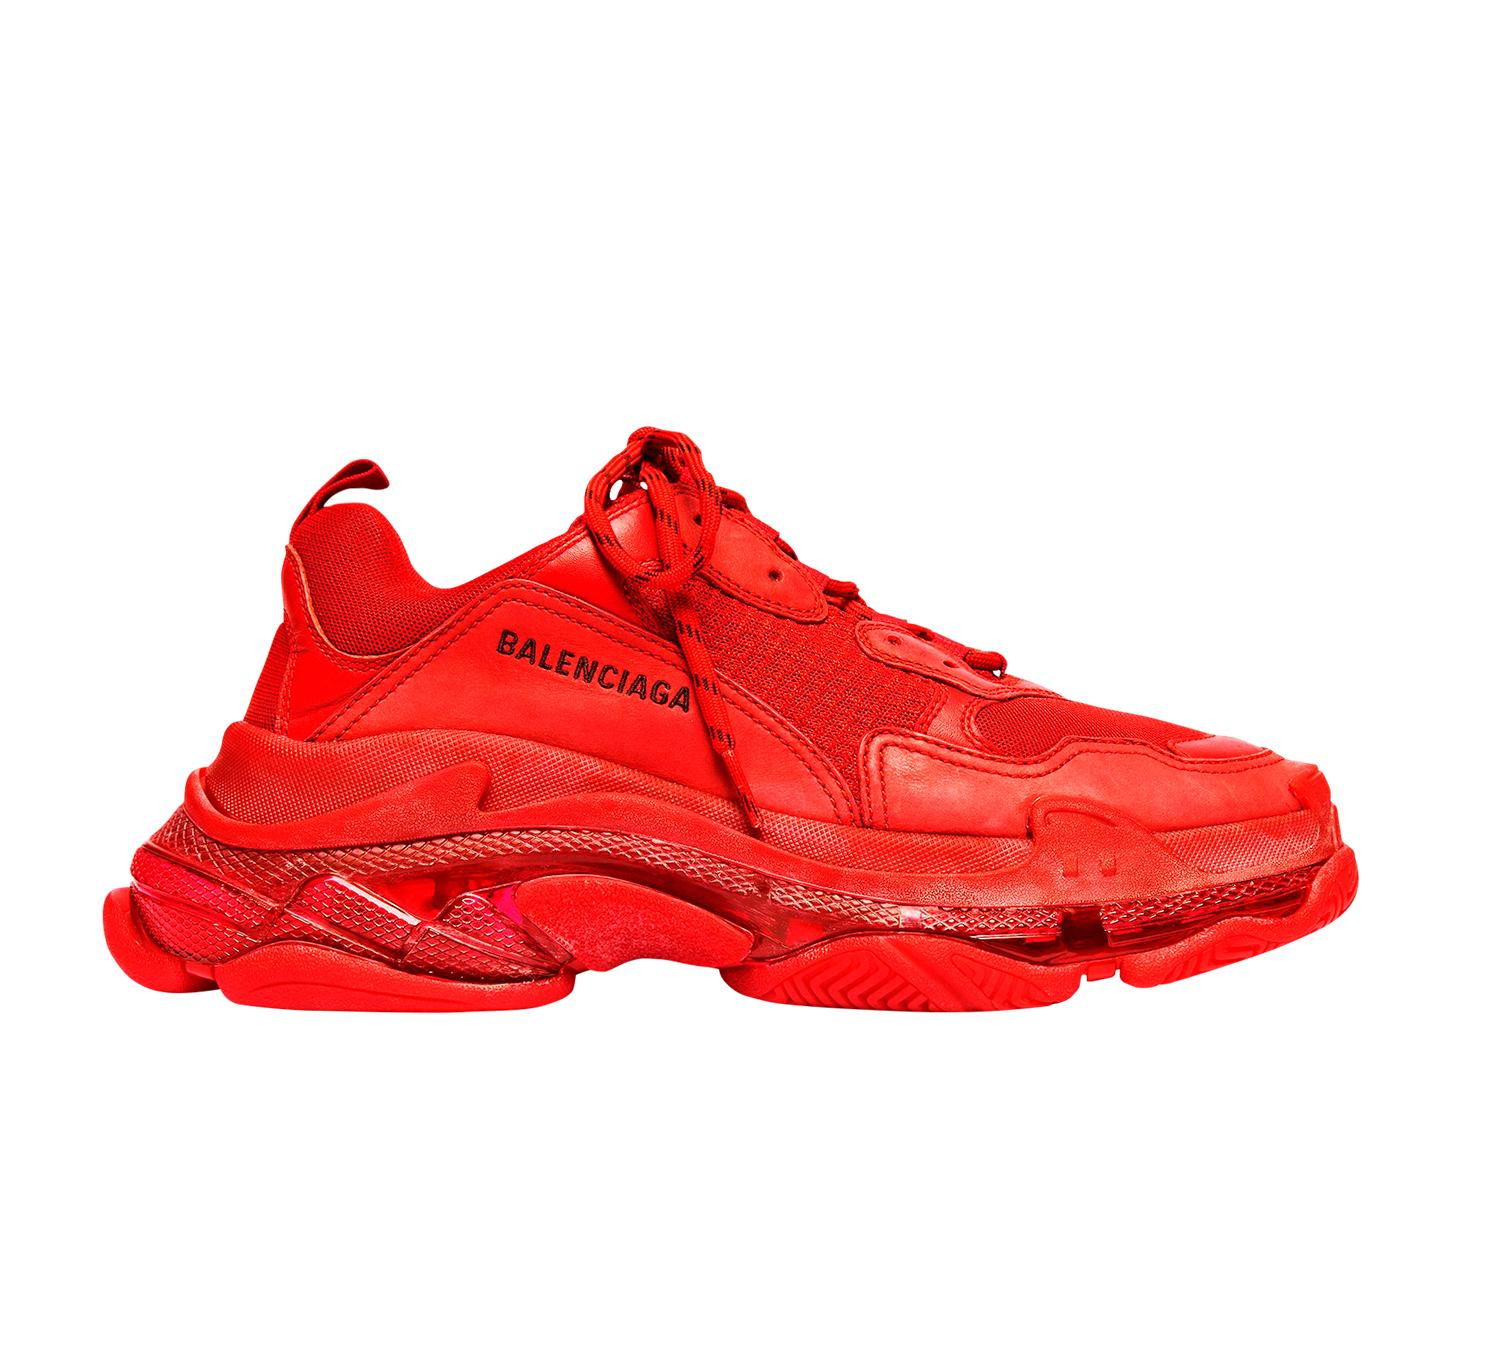 sneakers01_revistamine_interior